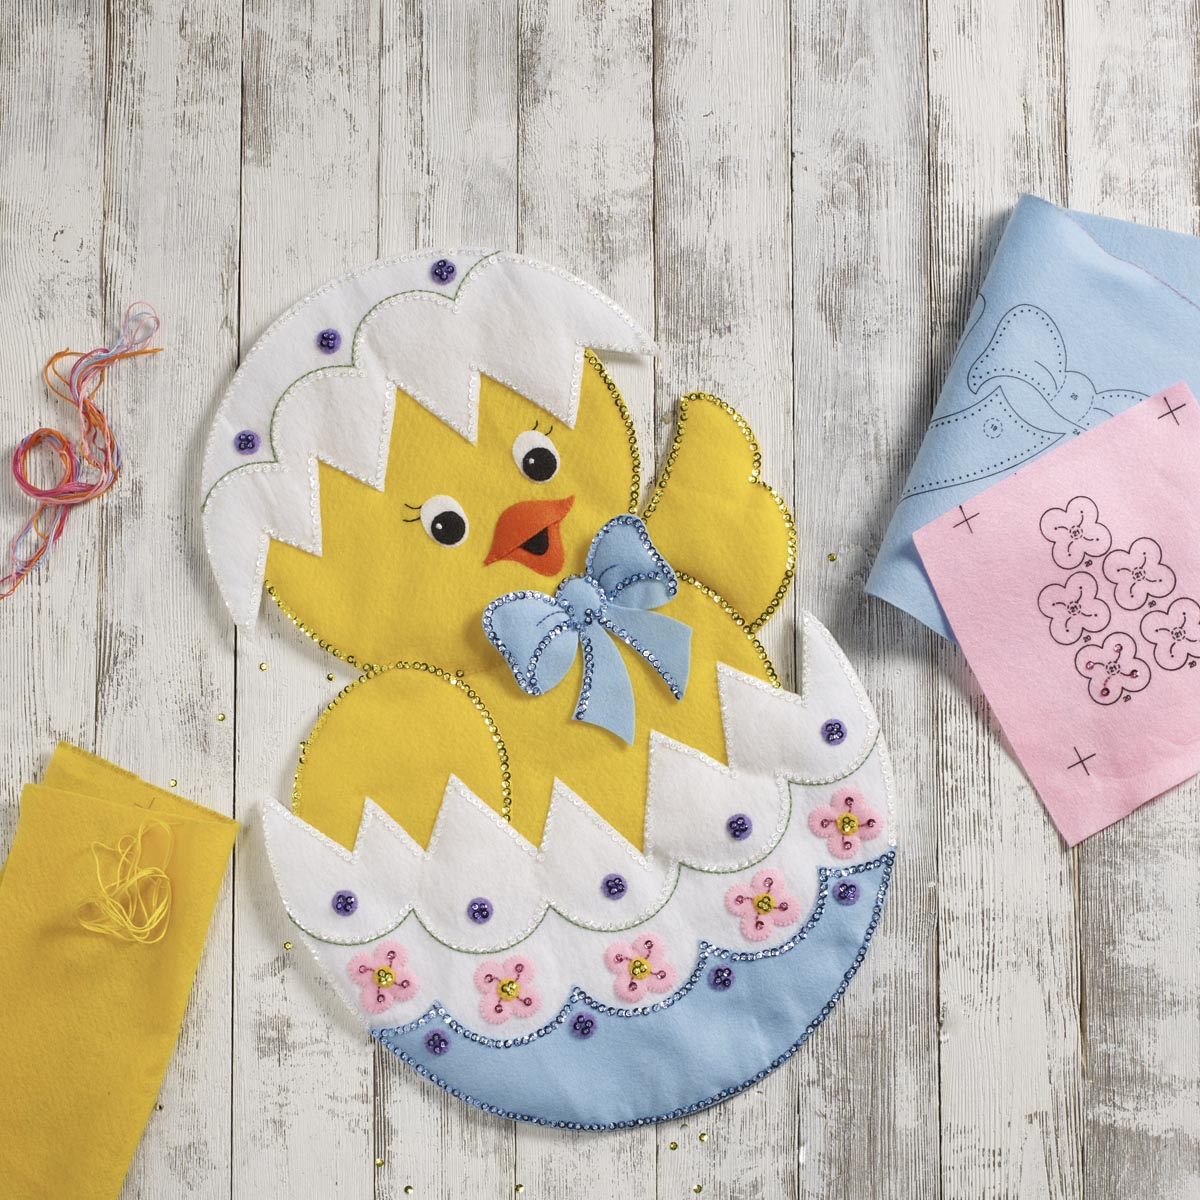 Bucilla ® Seasonal - Felt - Home Decor - Door/Wall Hanging Kits - Easter Chick